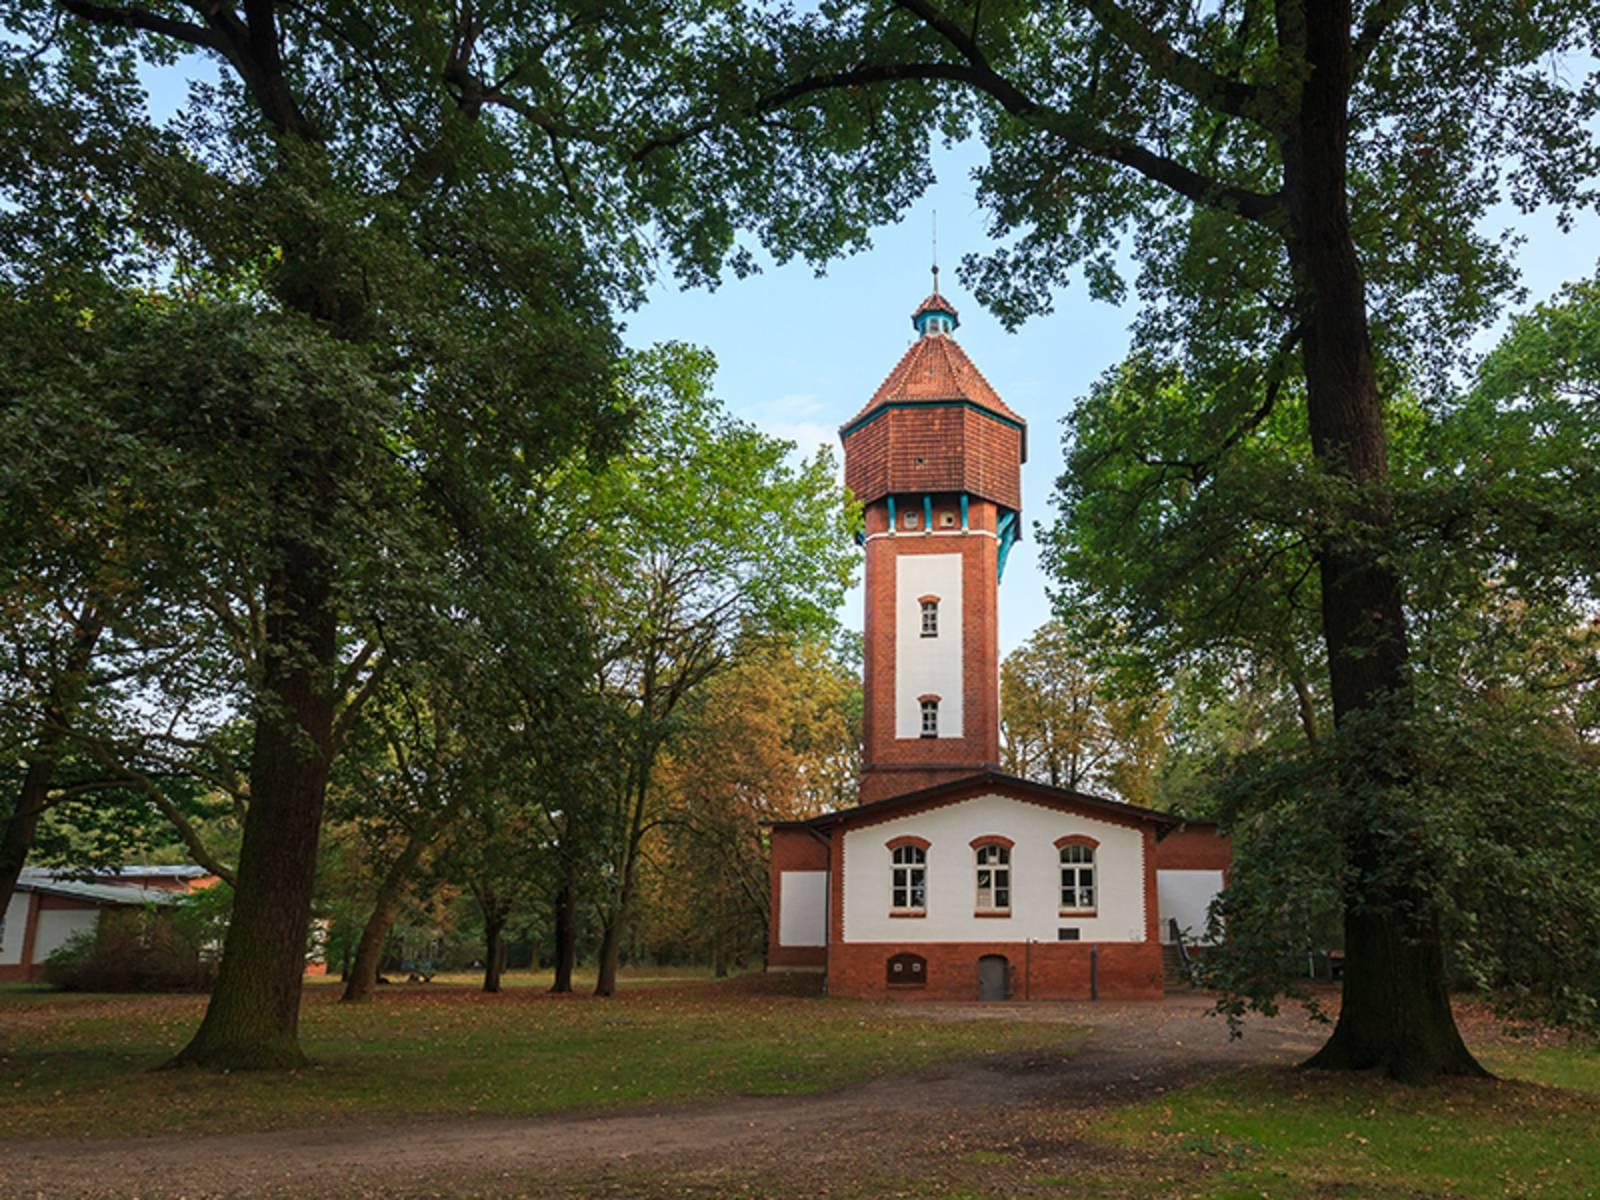 Wasserturm in Langenhagen